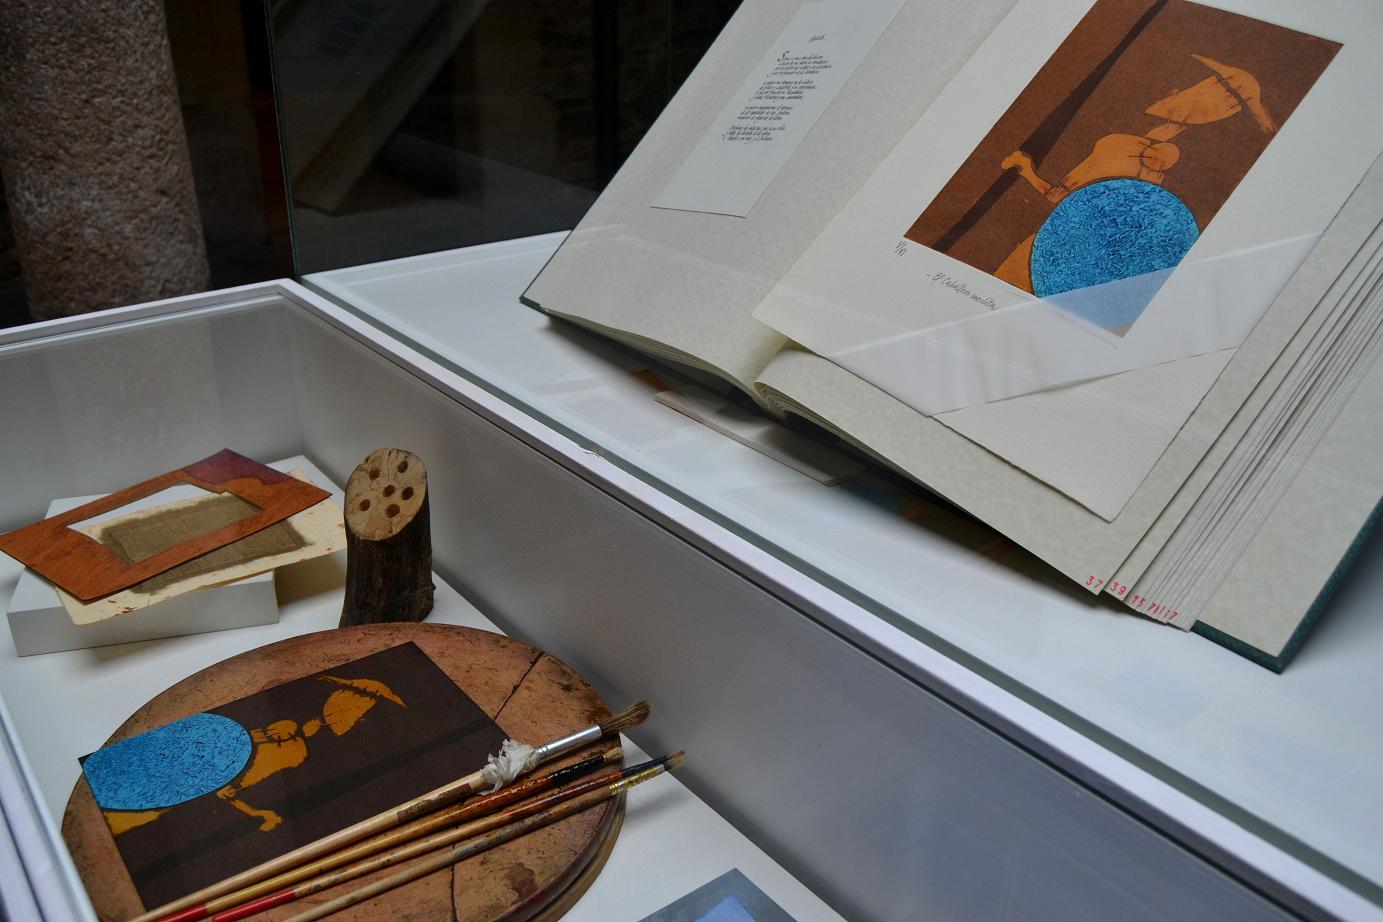 expo_juan_manuel_santos_glez_museobierzo_ponferrada_001